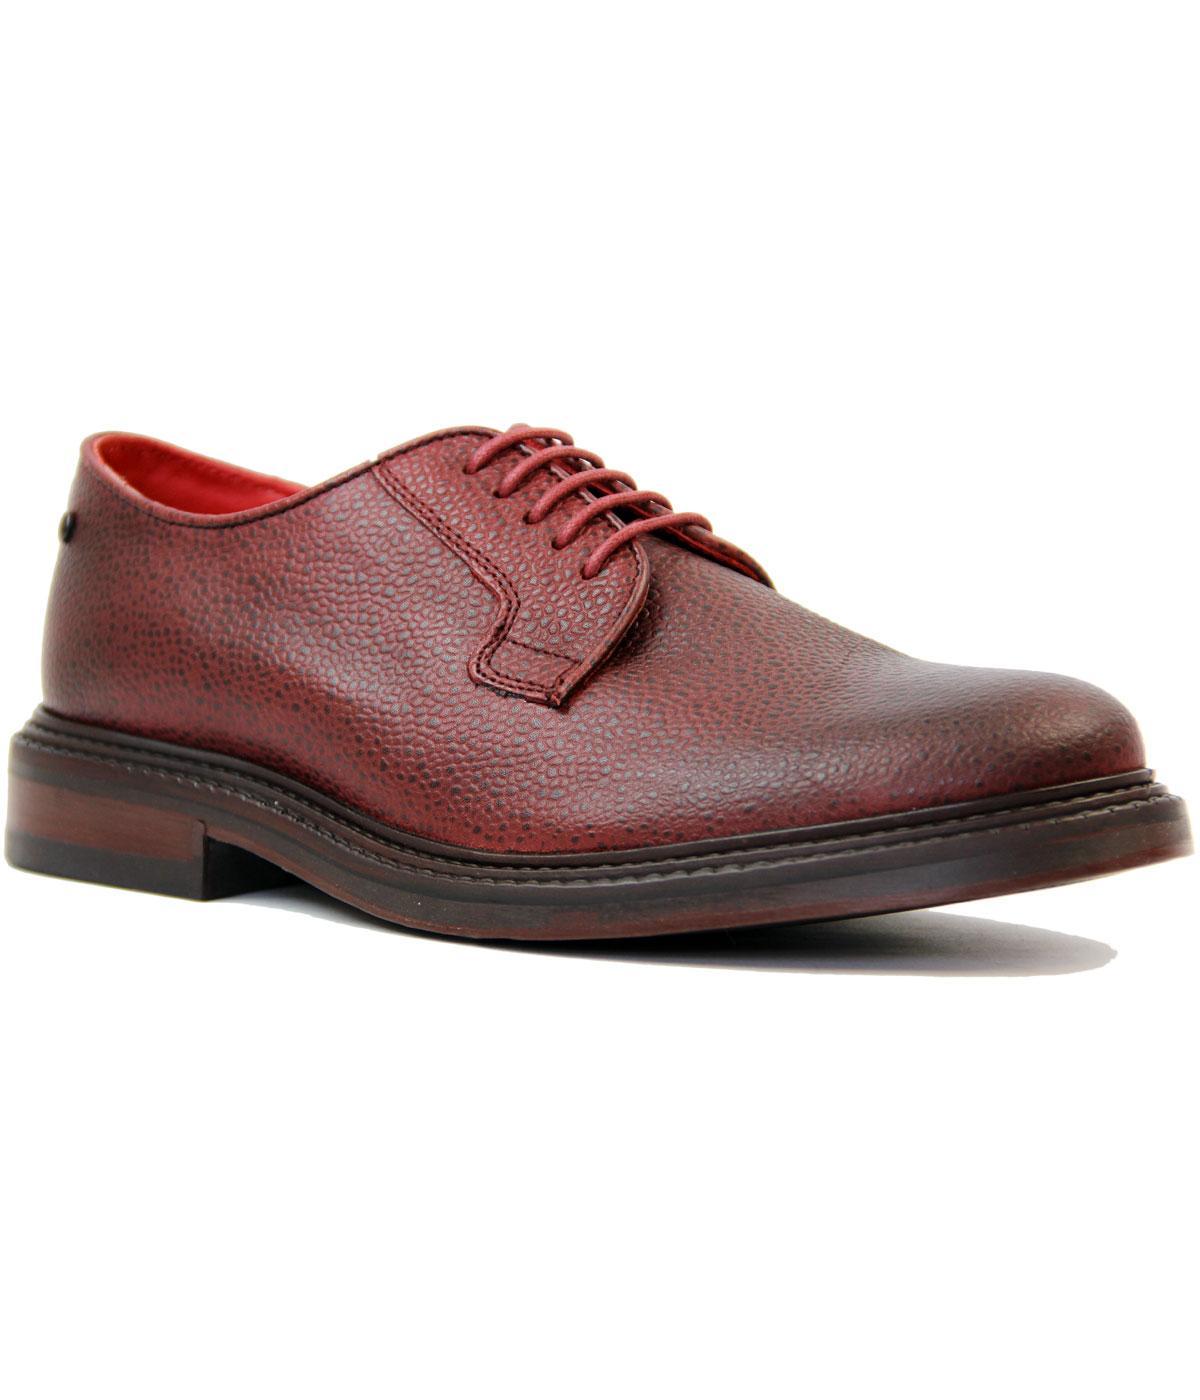 official photos 359eb 29558 BASE LONDON Maudsley Retro Mod Scotch Grain Derby Shoes in Red